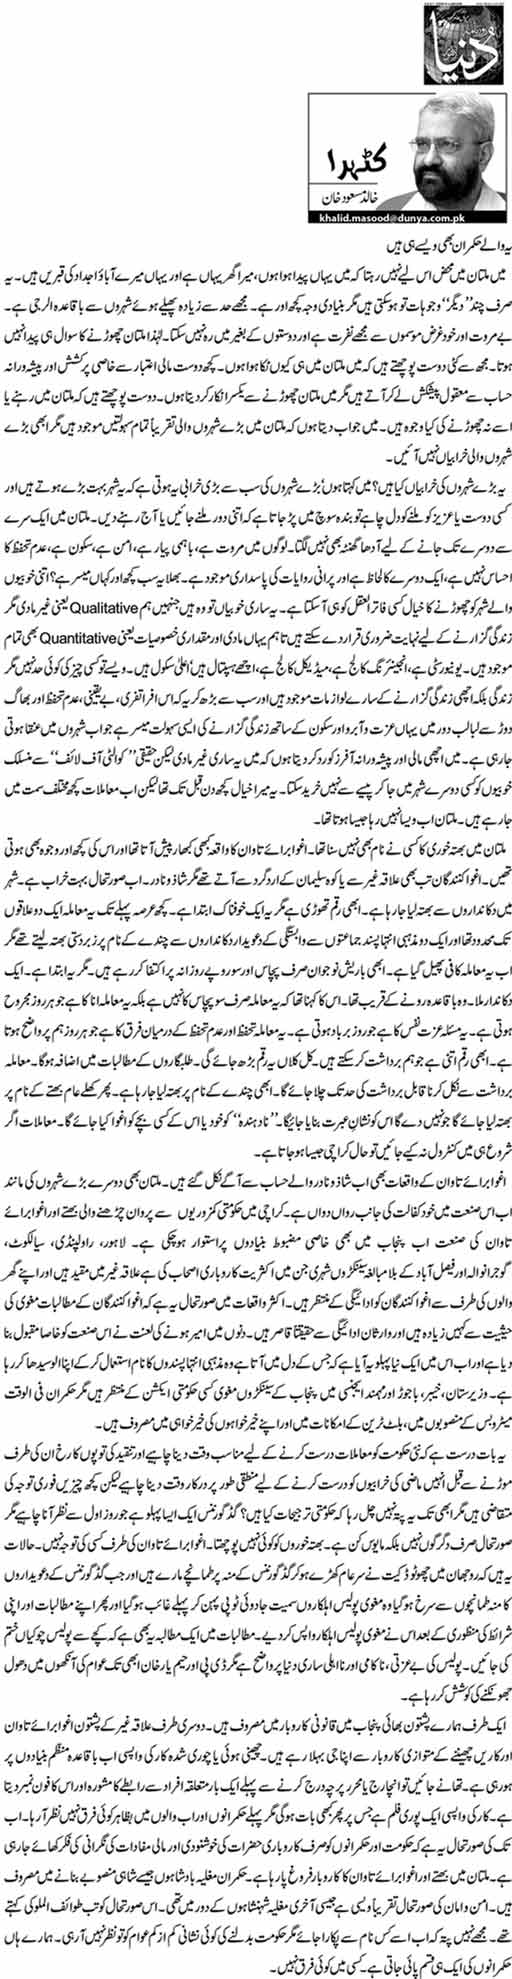 Yeh Walay Hukmaran Bhi Waisay Hi Hain - Khalid Masood Khan